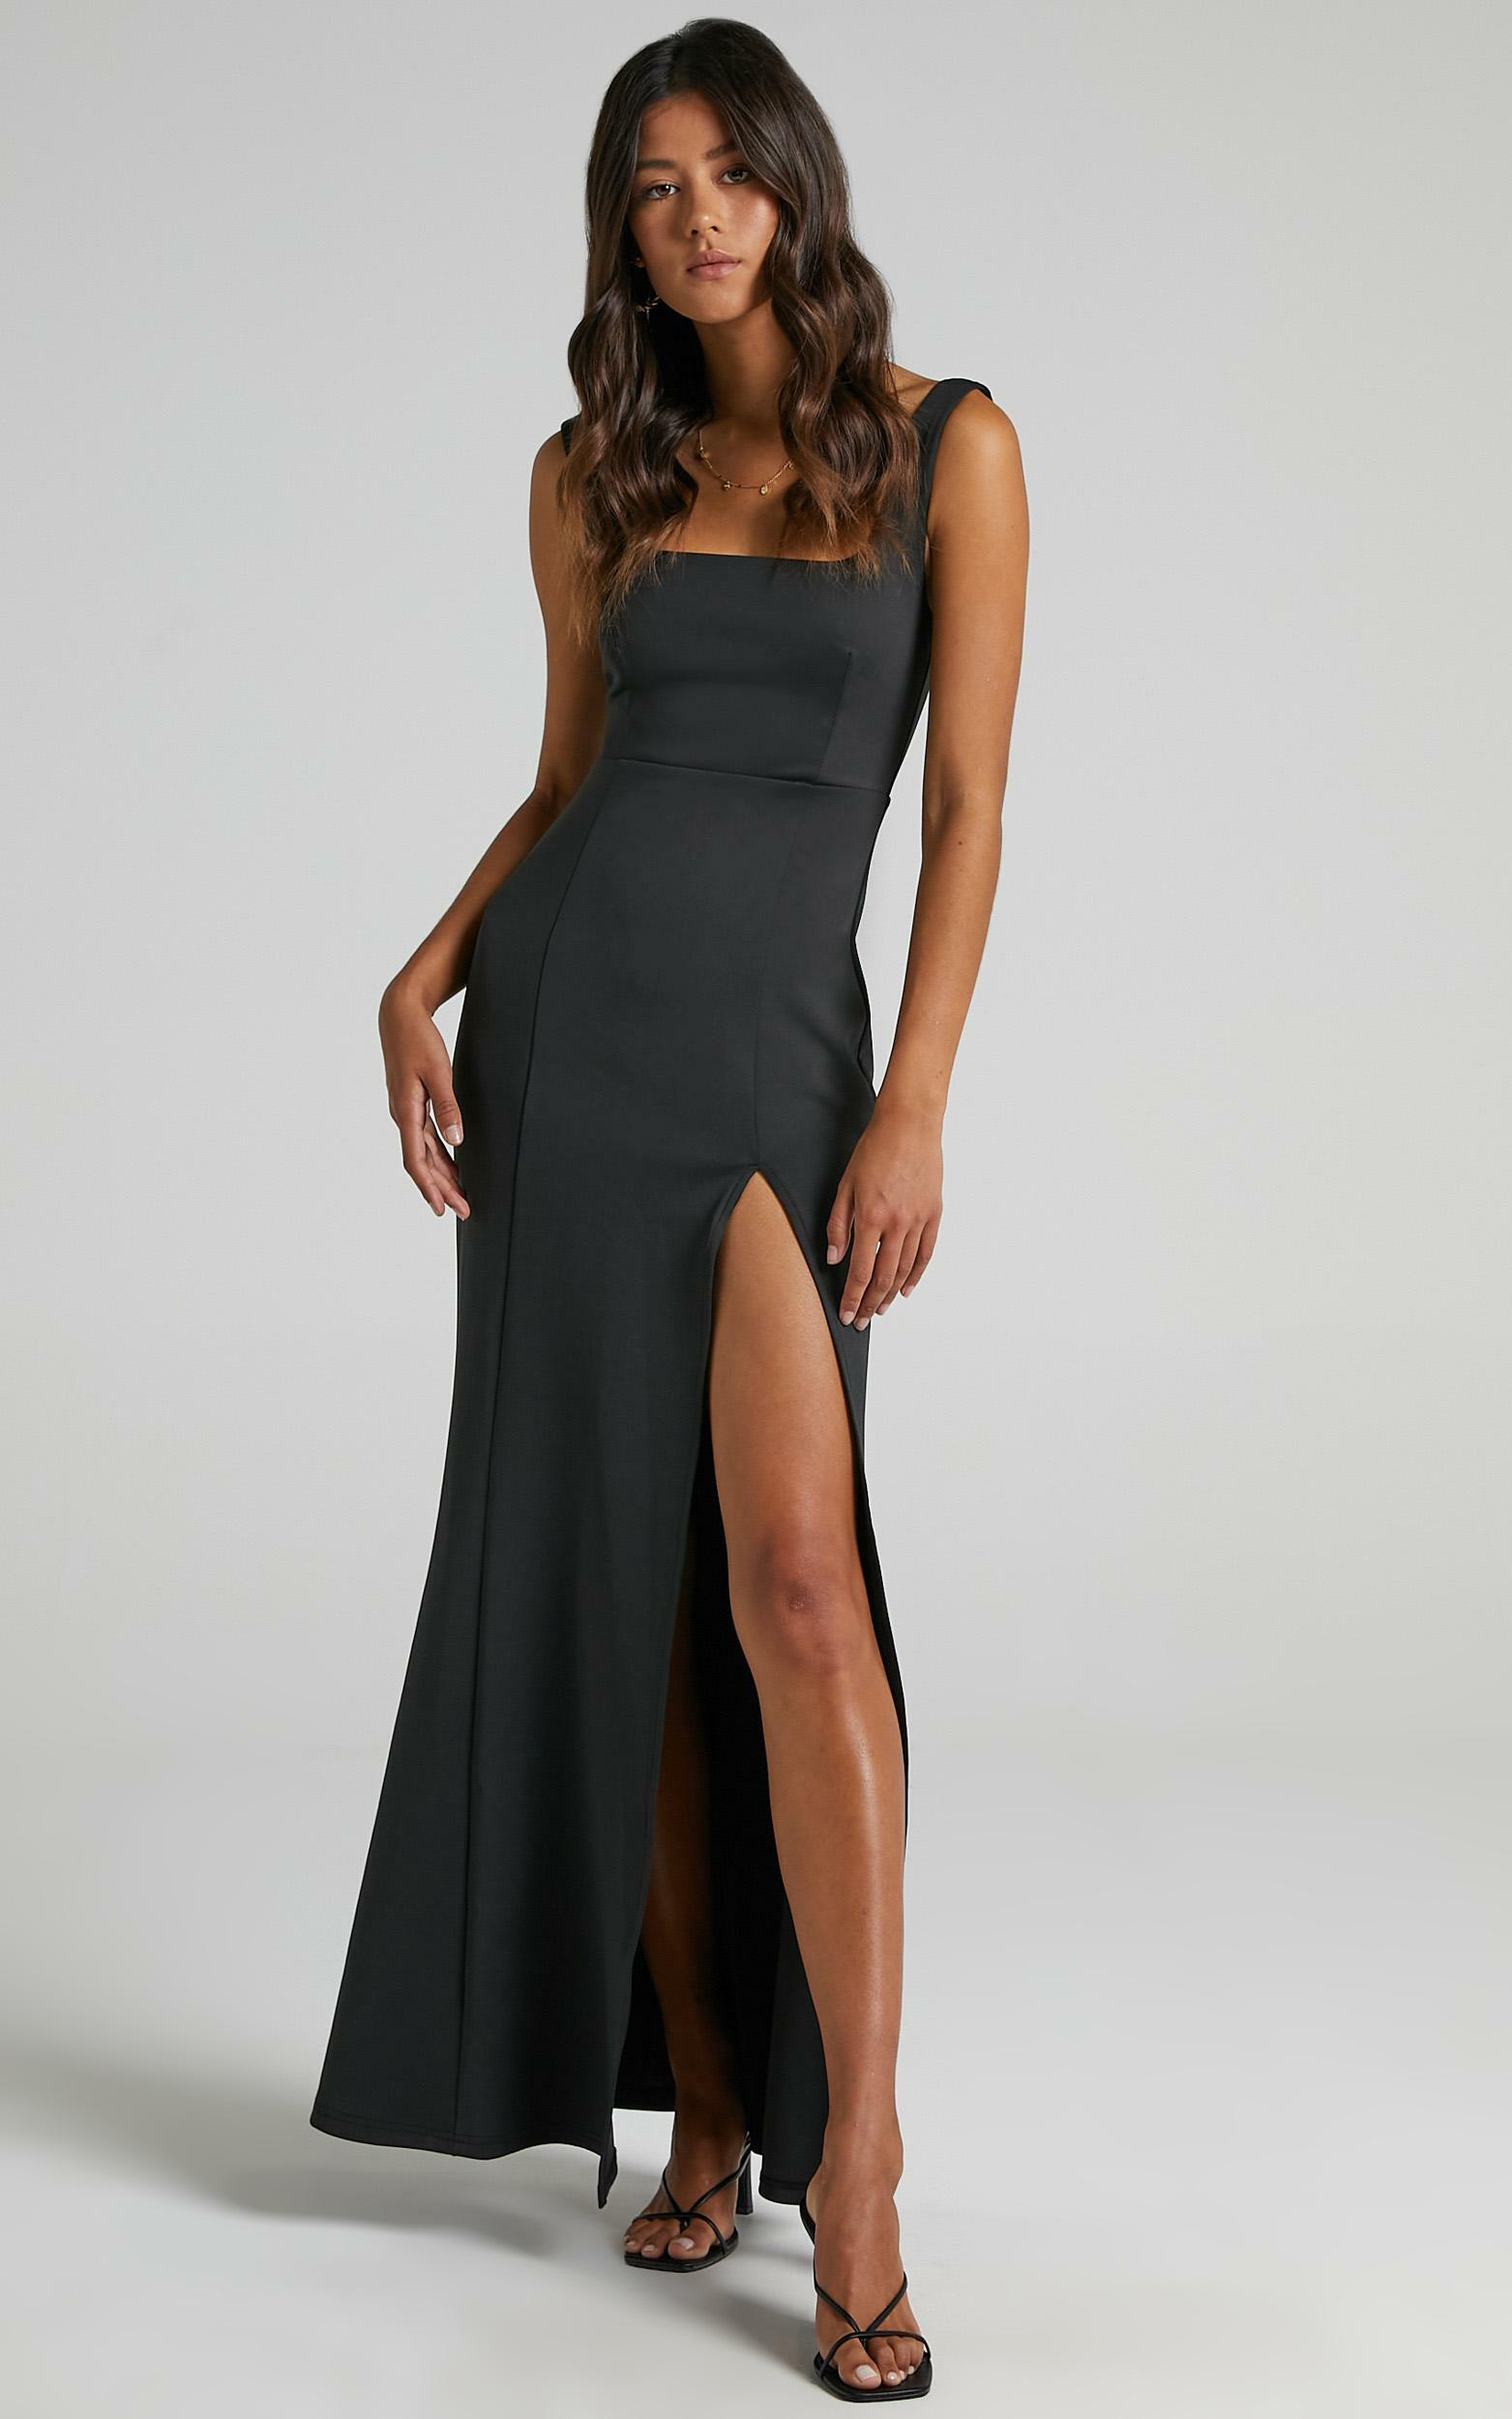 Raquelle Square Neck Thigh Split Maxi Dress in Black - 06, BLK1, hi-res image number null